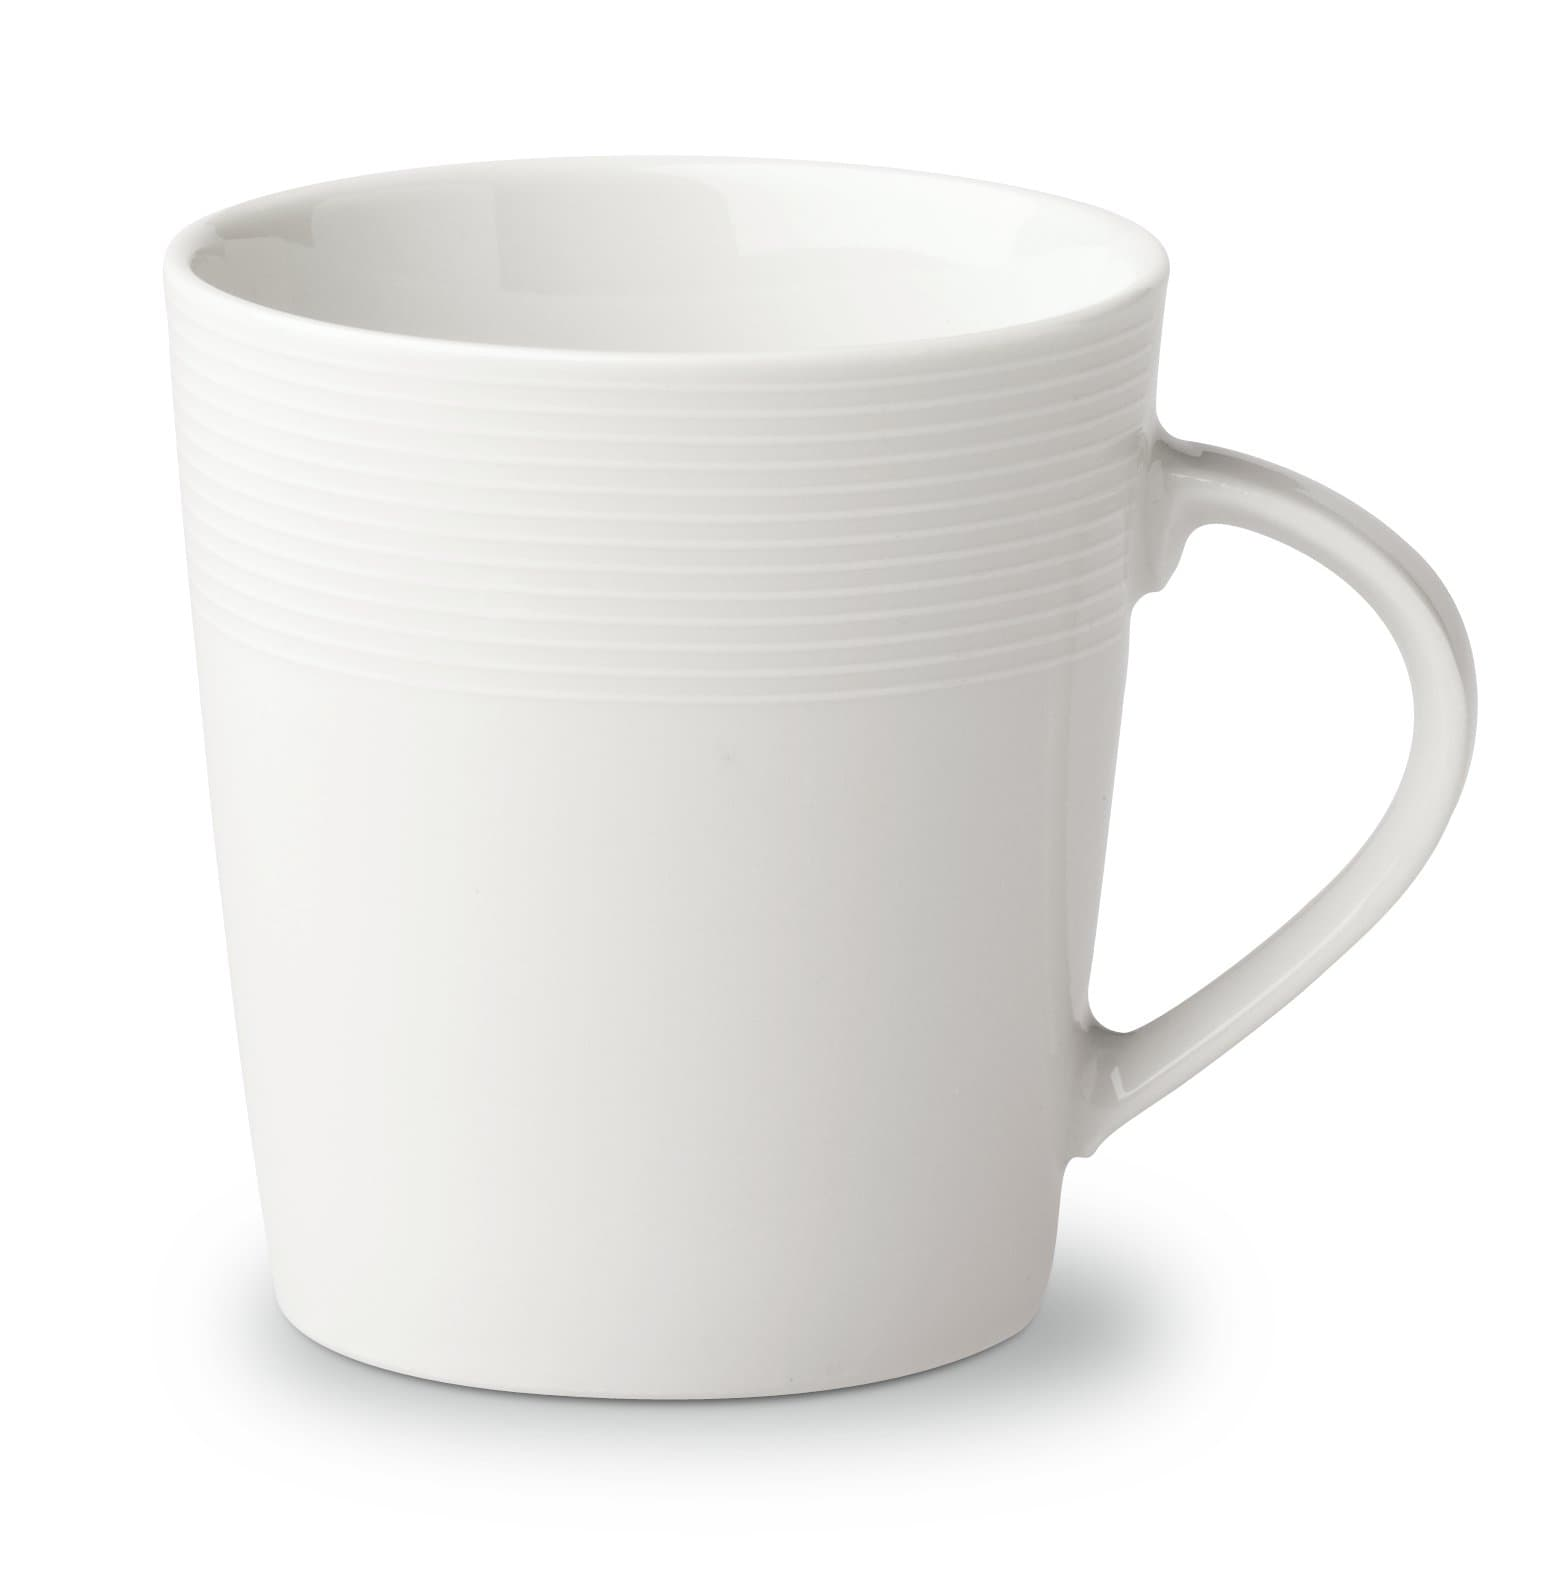 Cucina & Tavola VIENNA Mug